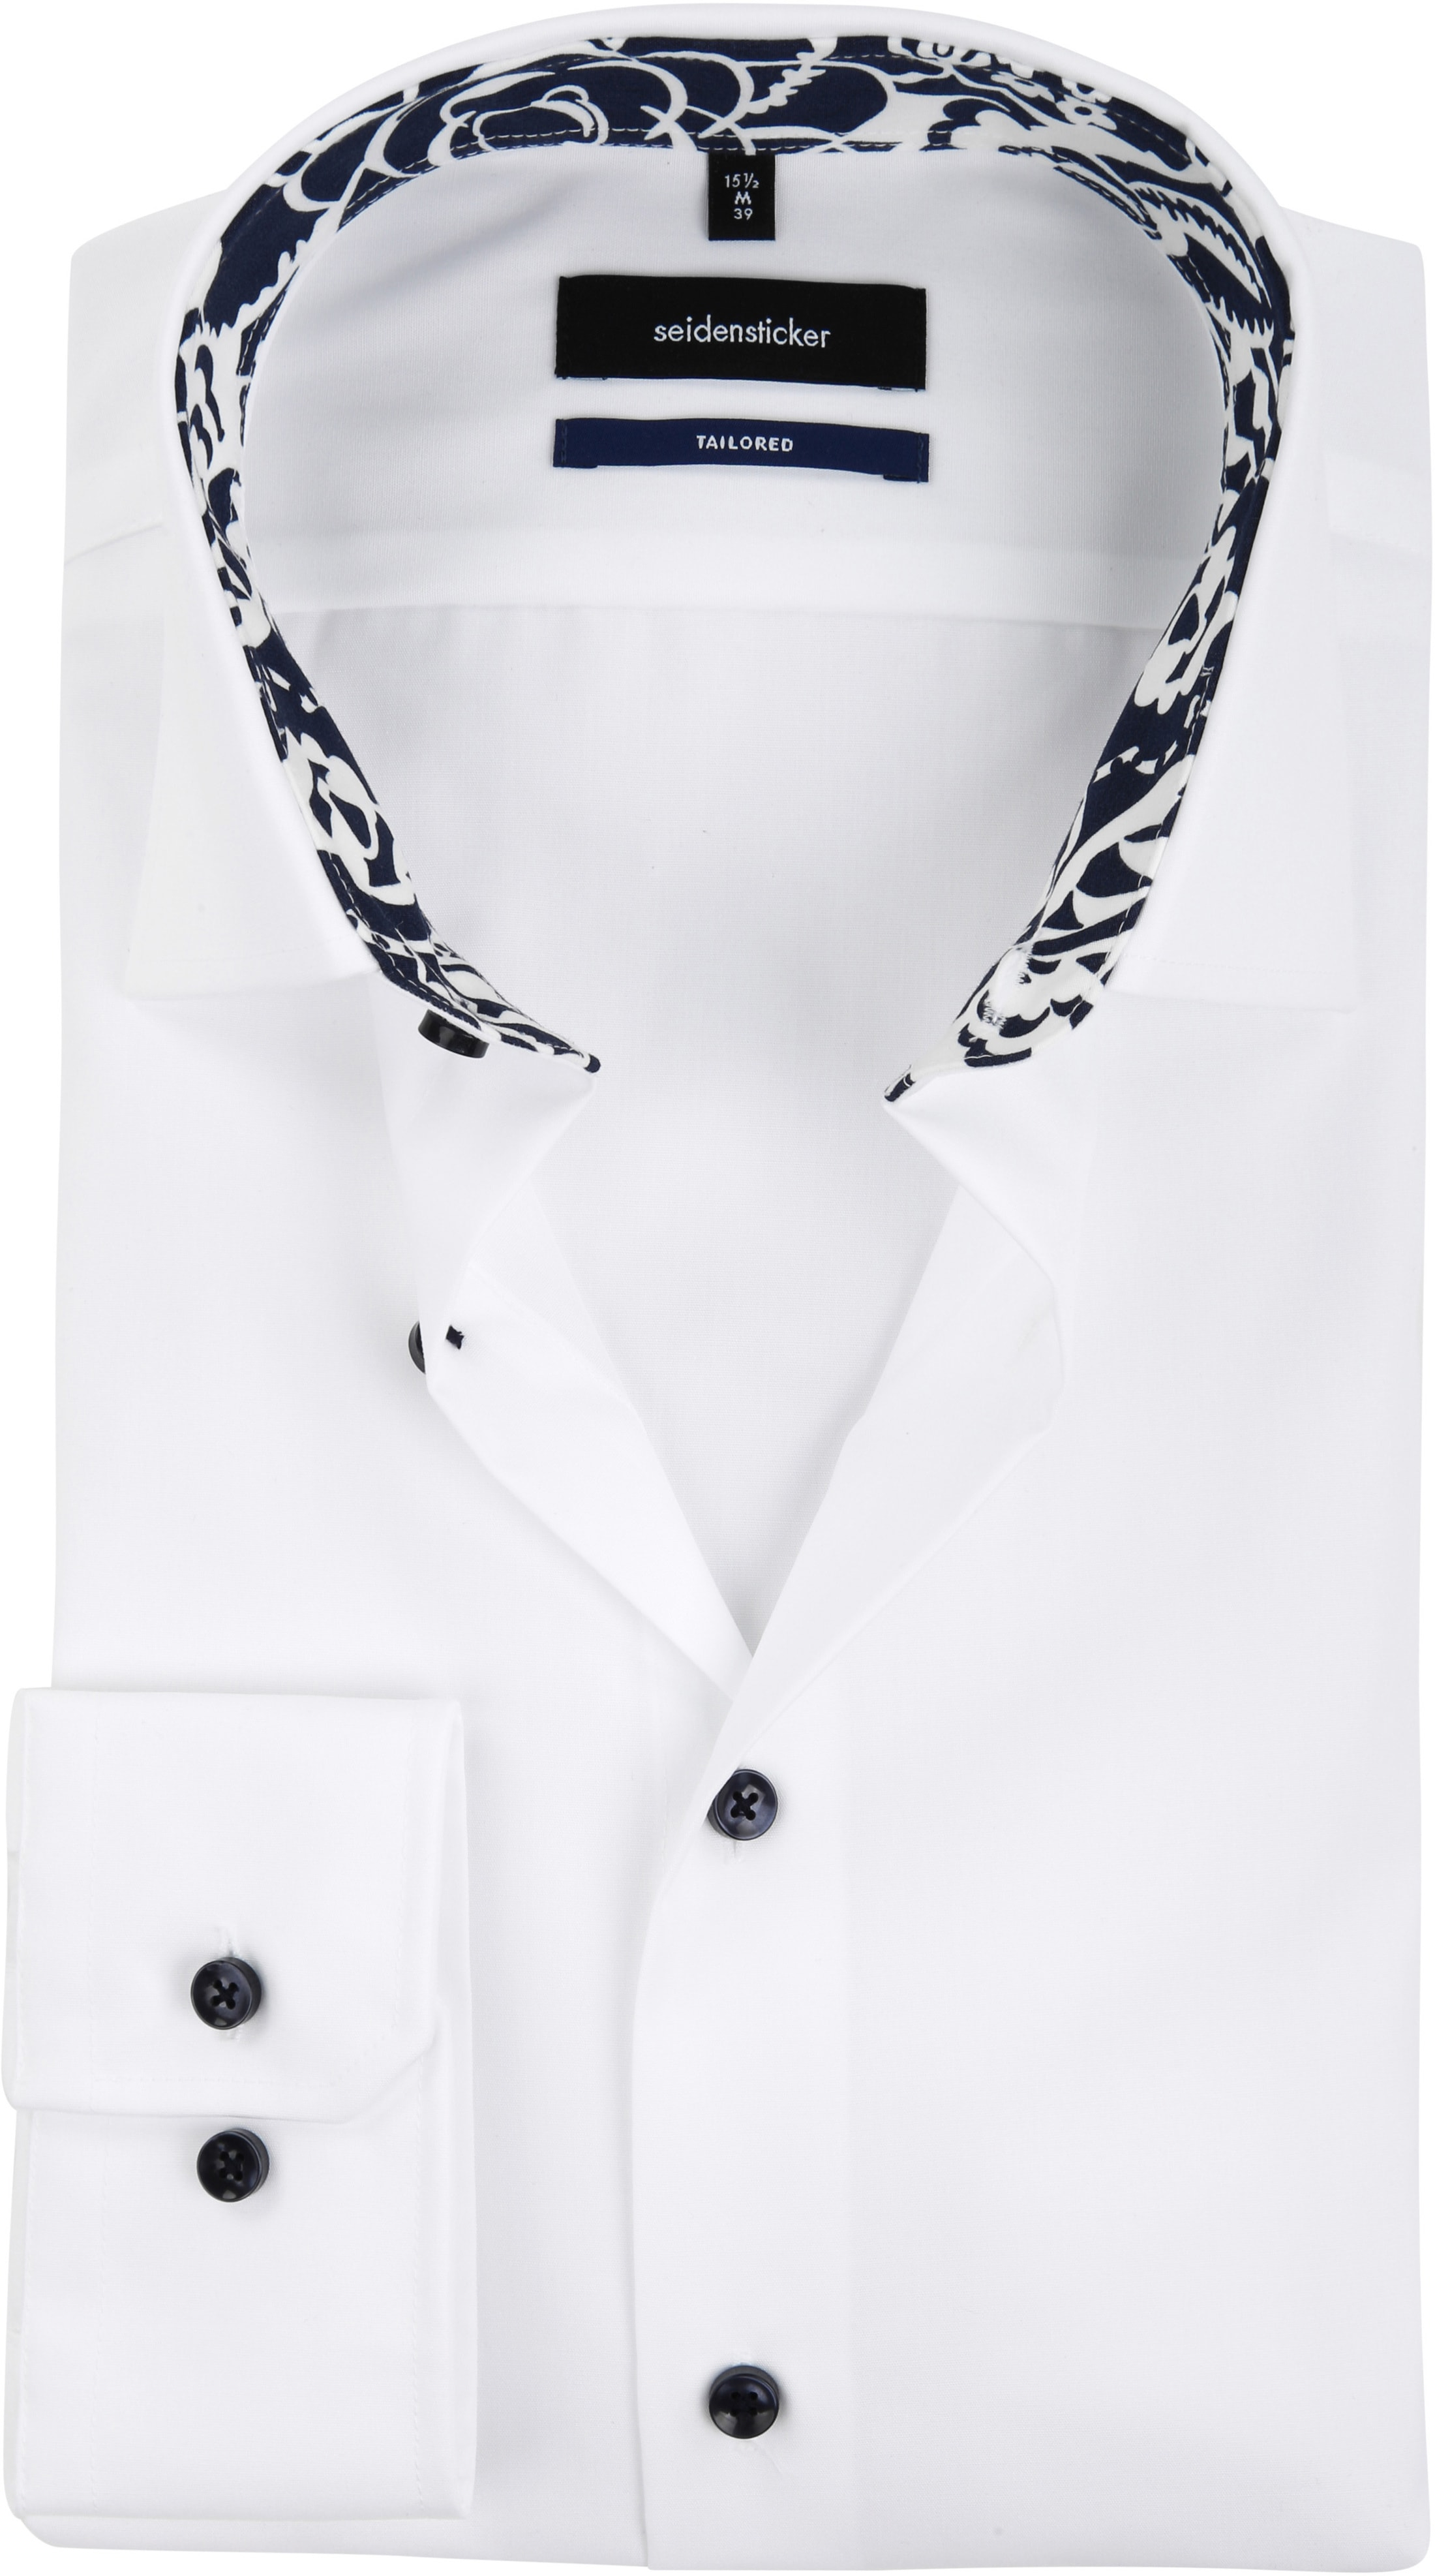 Tailored Fit Overhemd.Seidensticker Overhemd Tailor Fit Wit 01 232816 Online Bestellen